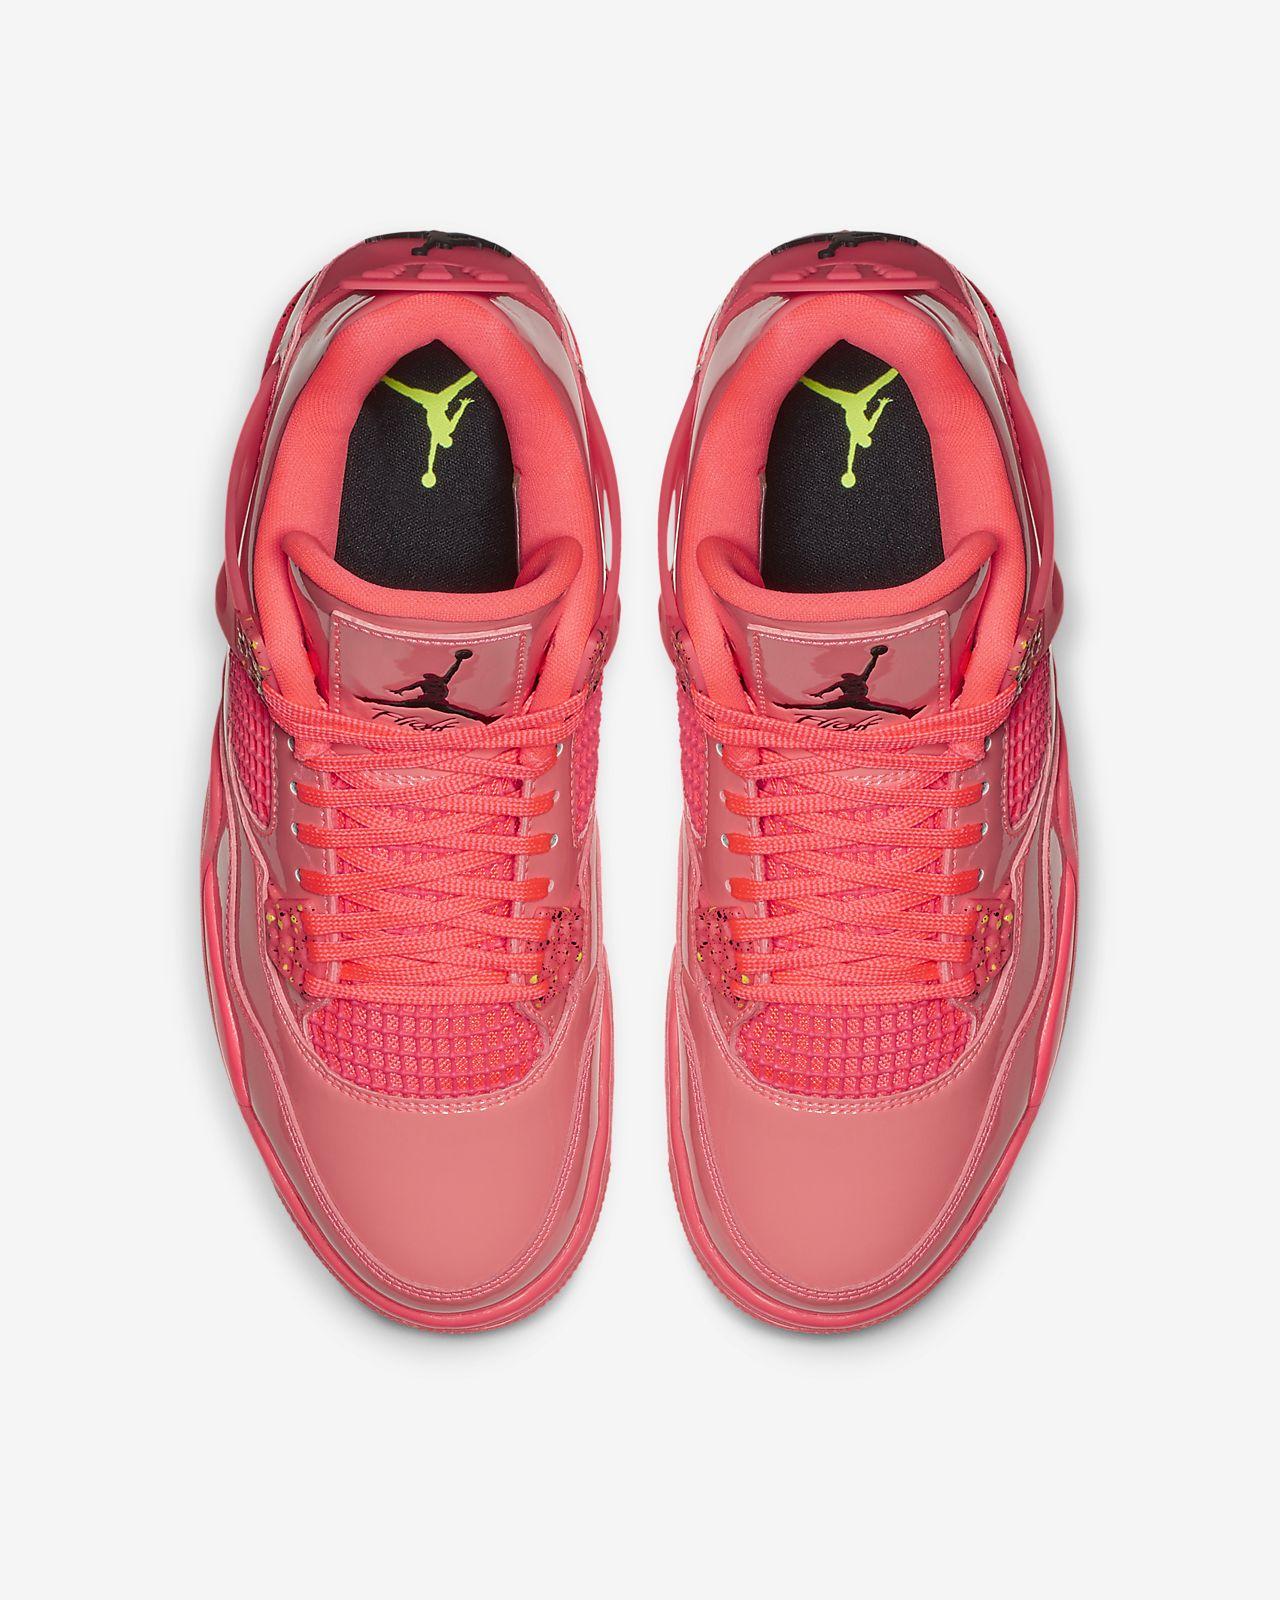 953683cfb77fb3 Air Jordan 4 Retro NRG Women s Shoe. Nike.com ID